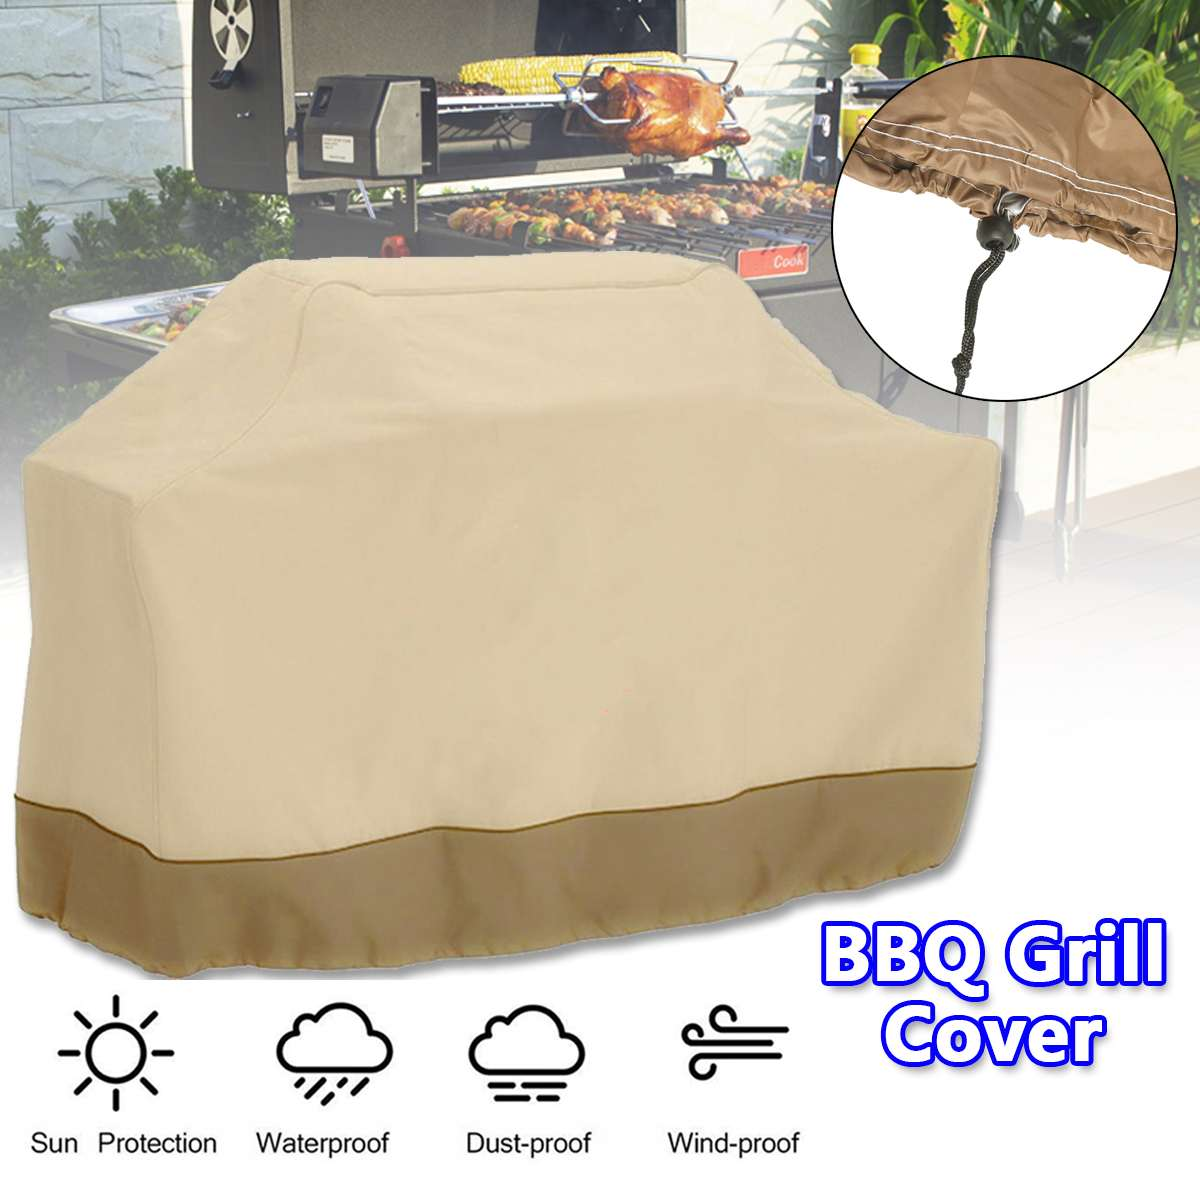 Cubierta impermeable para Barbacoa cubierta para lluvia de exterior a prueba de...